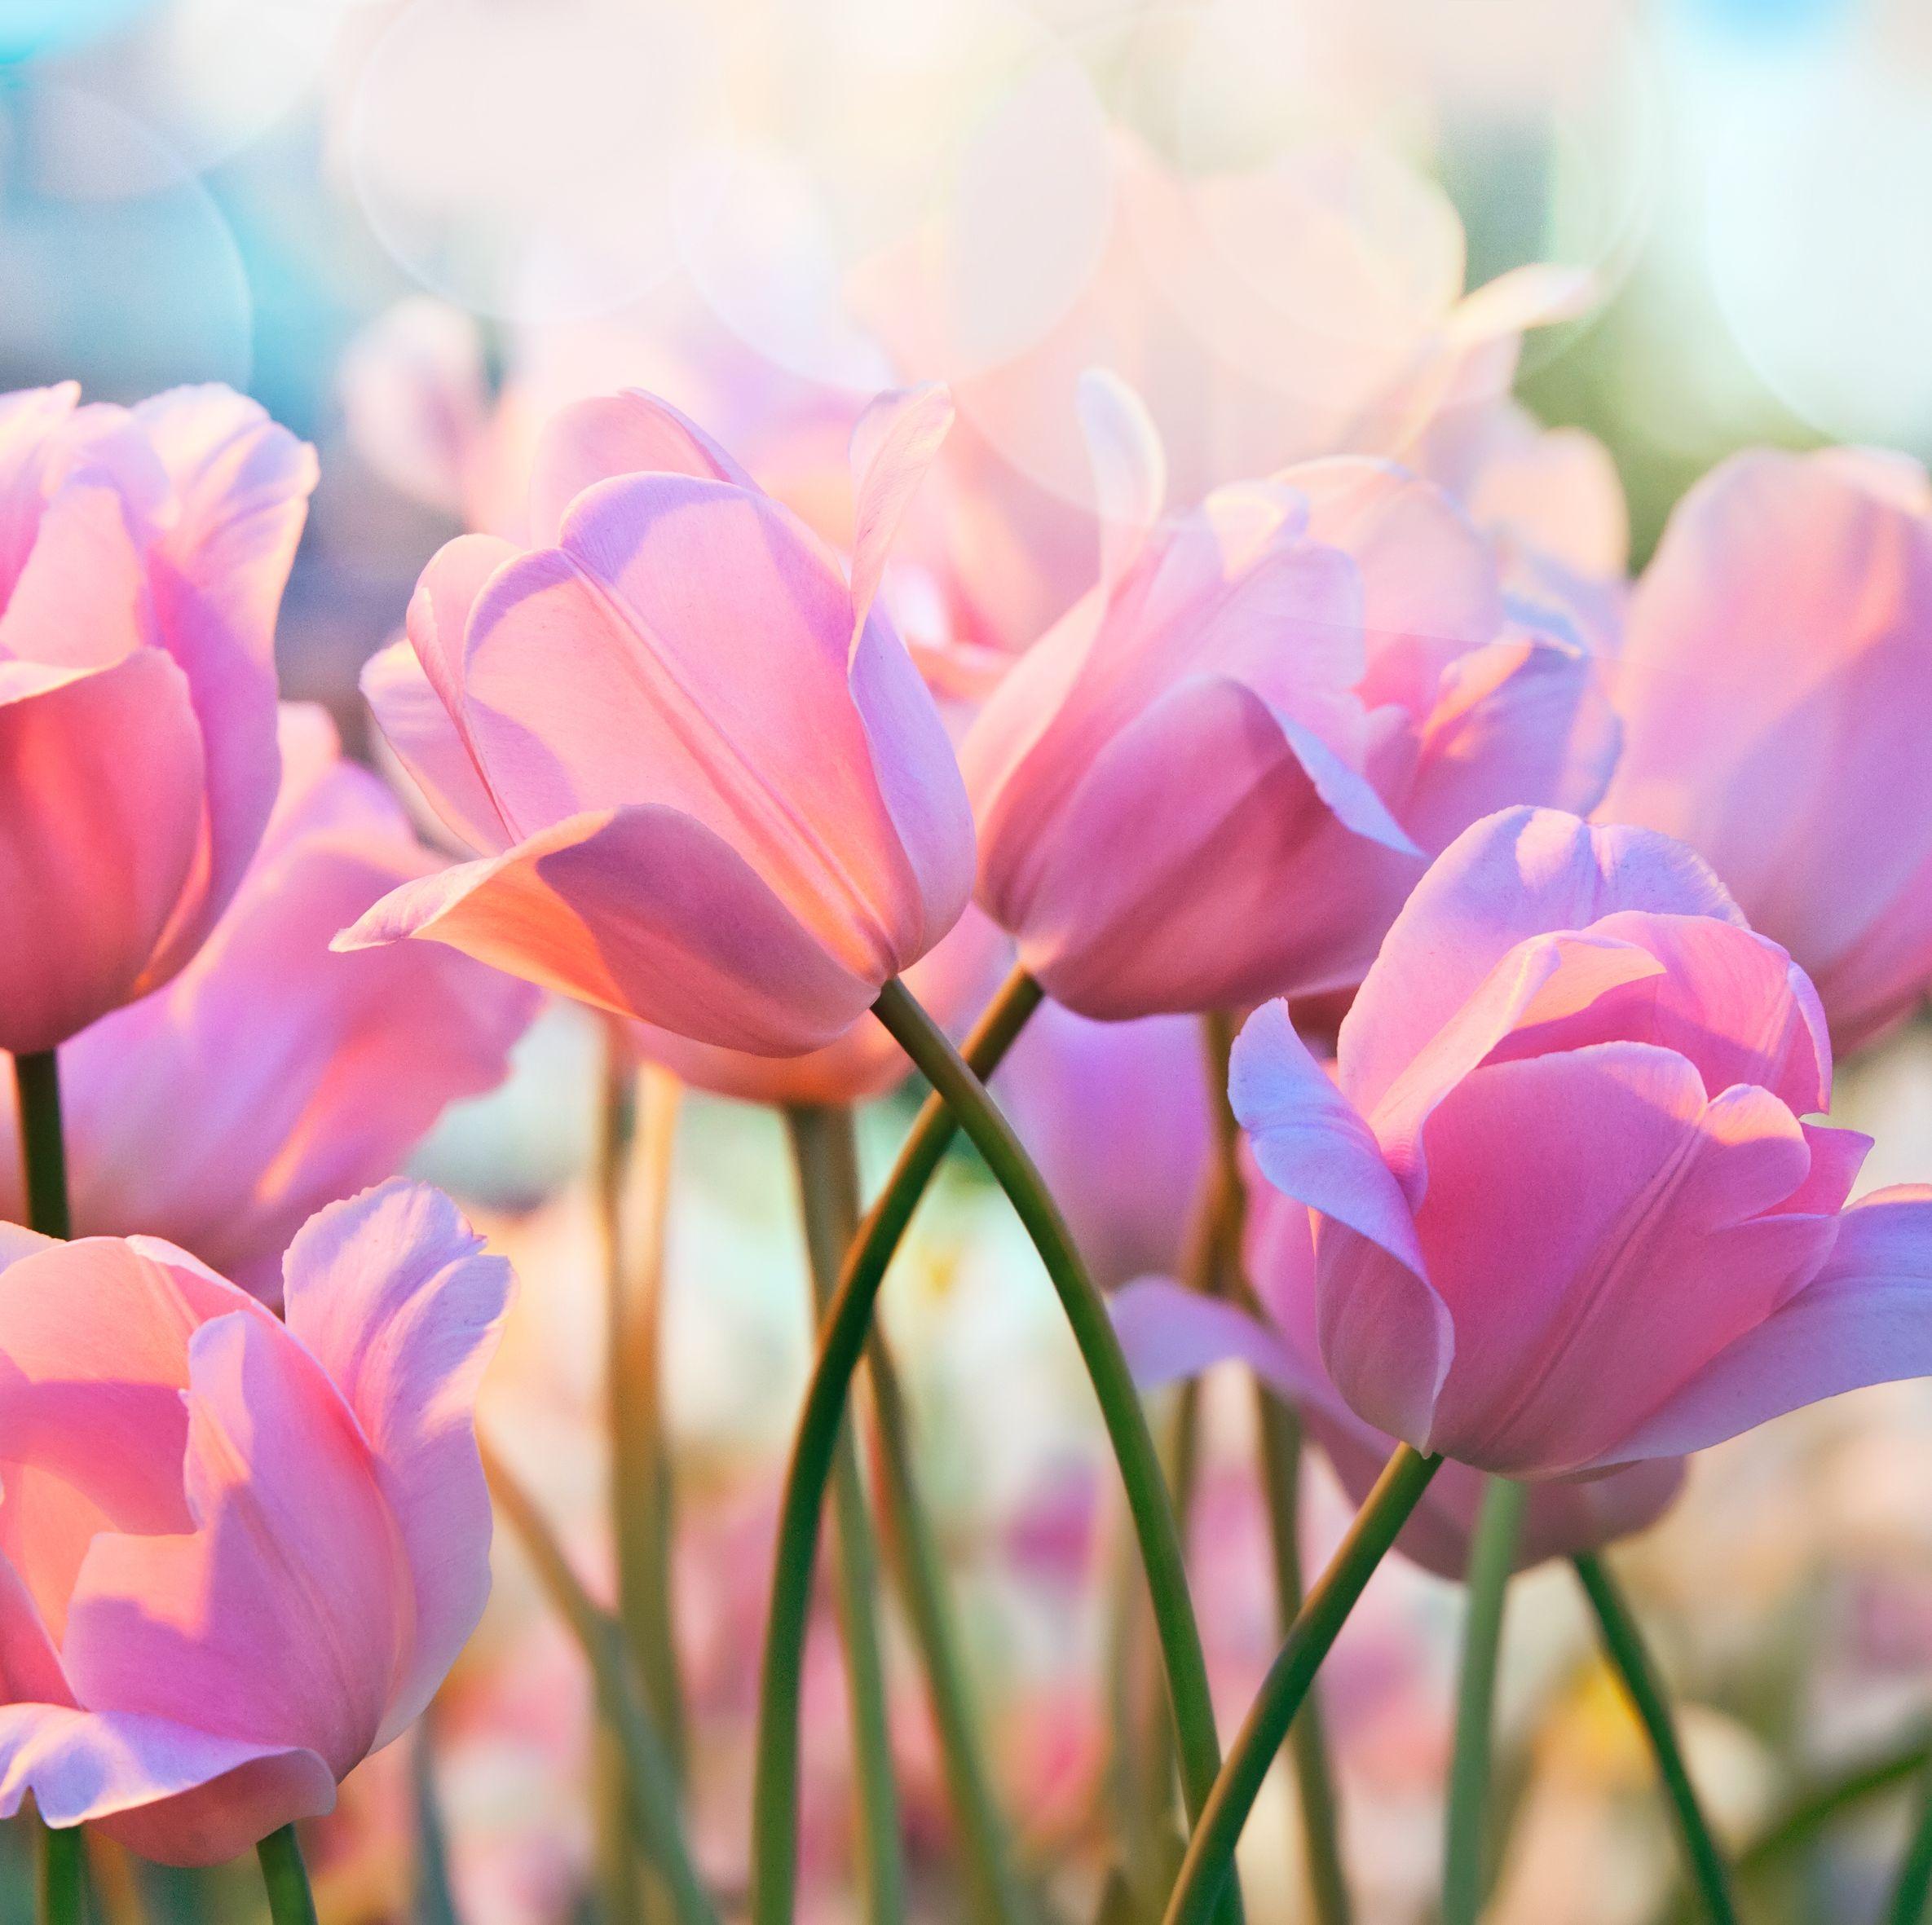 spring-quotes-1551896399.jpg?crop=0.669xw:1.00xh;0.166xw,0&resize=640:*